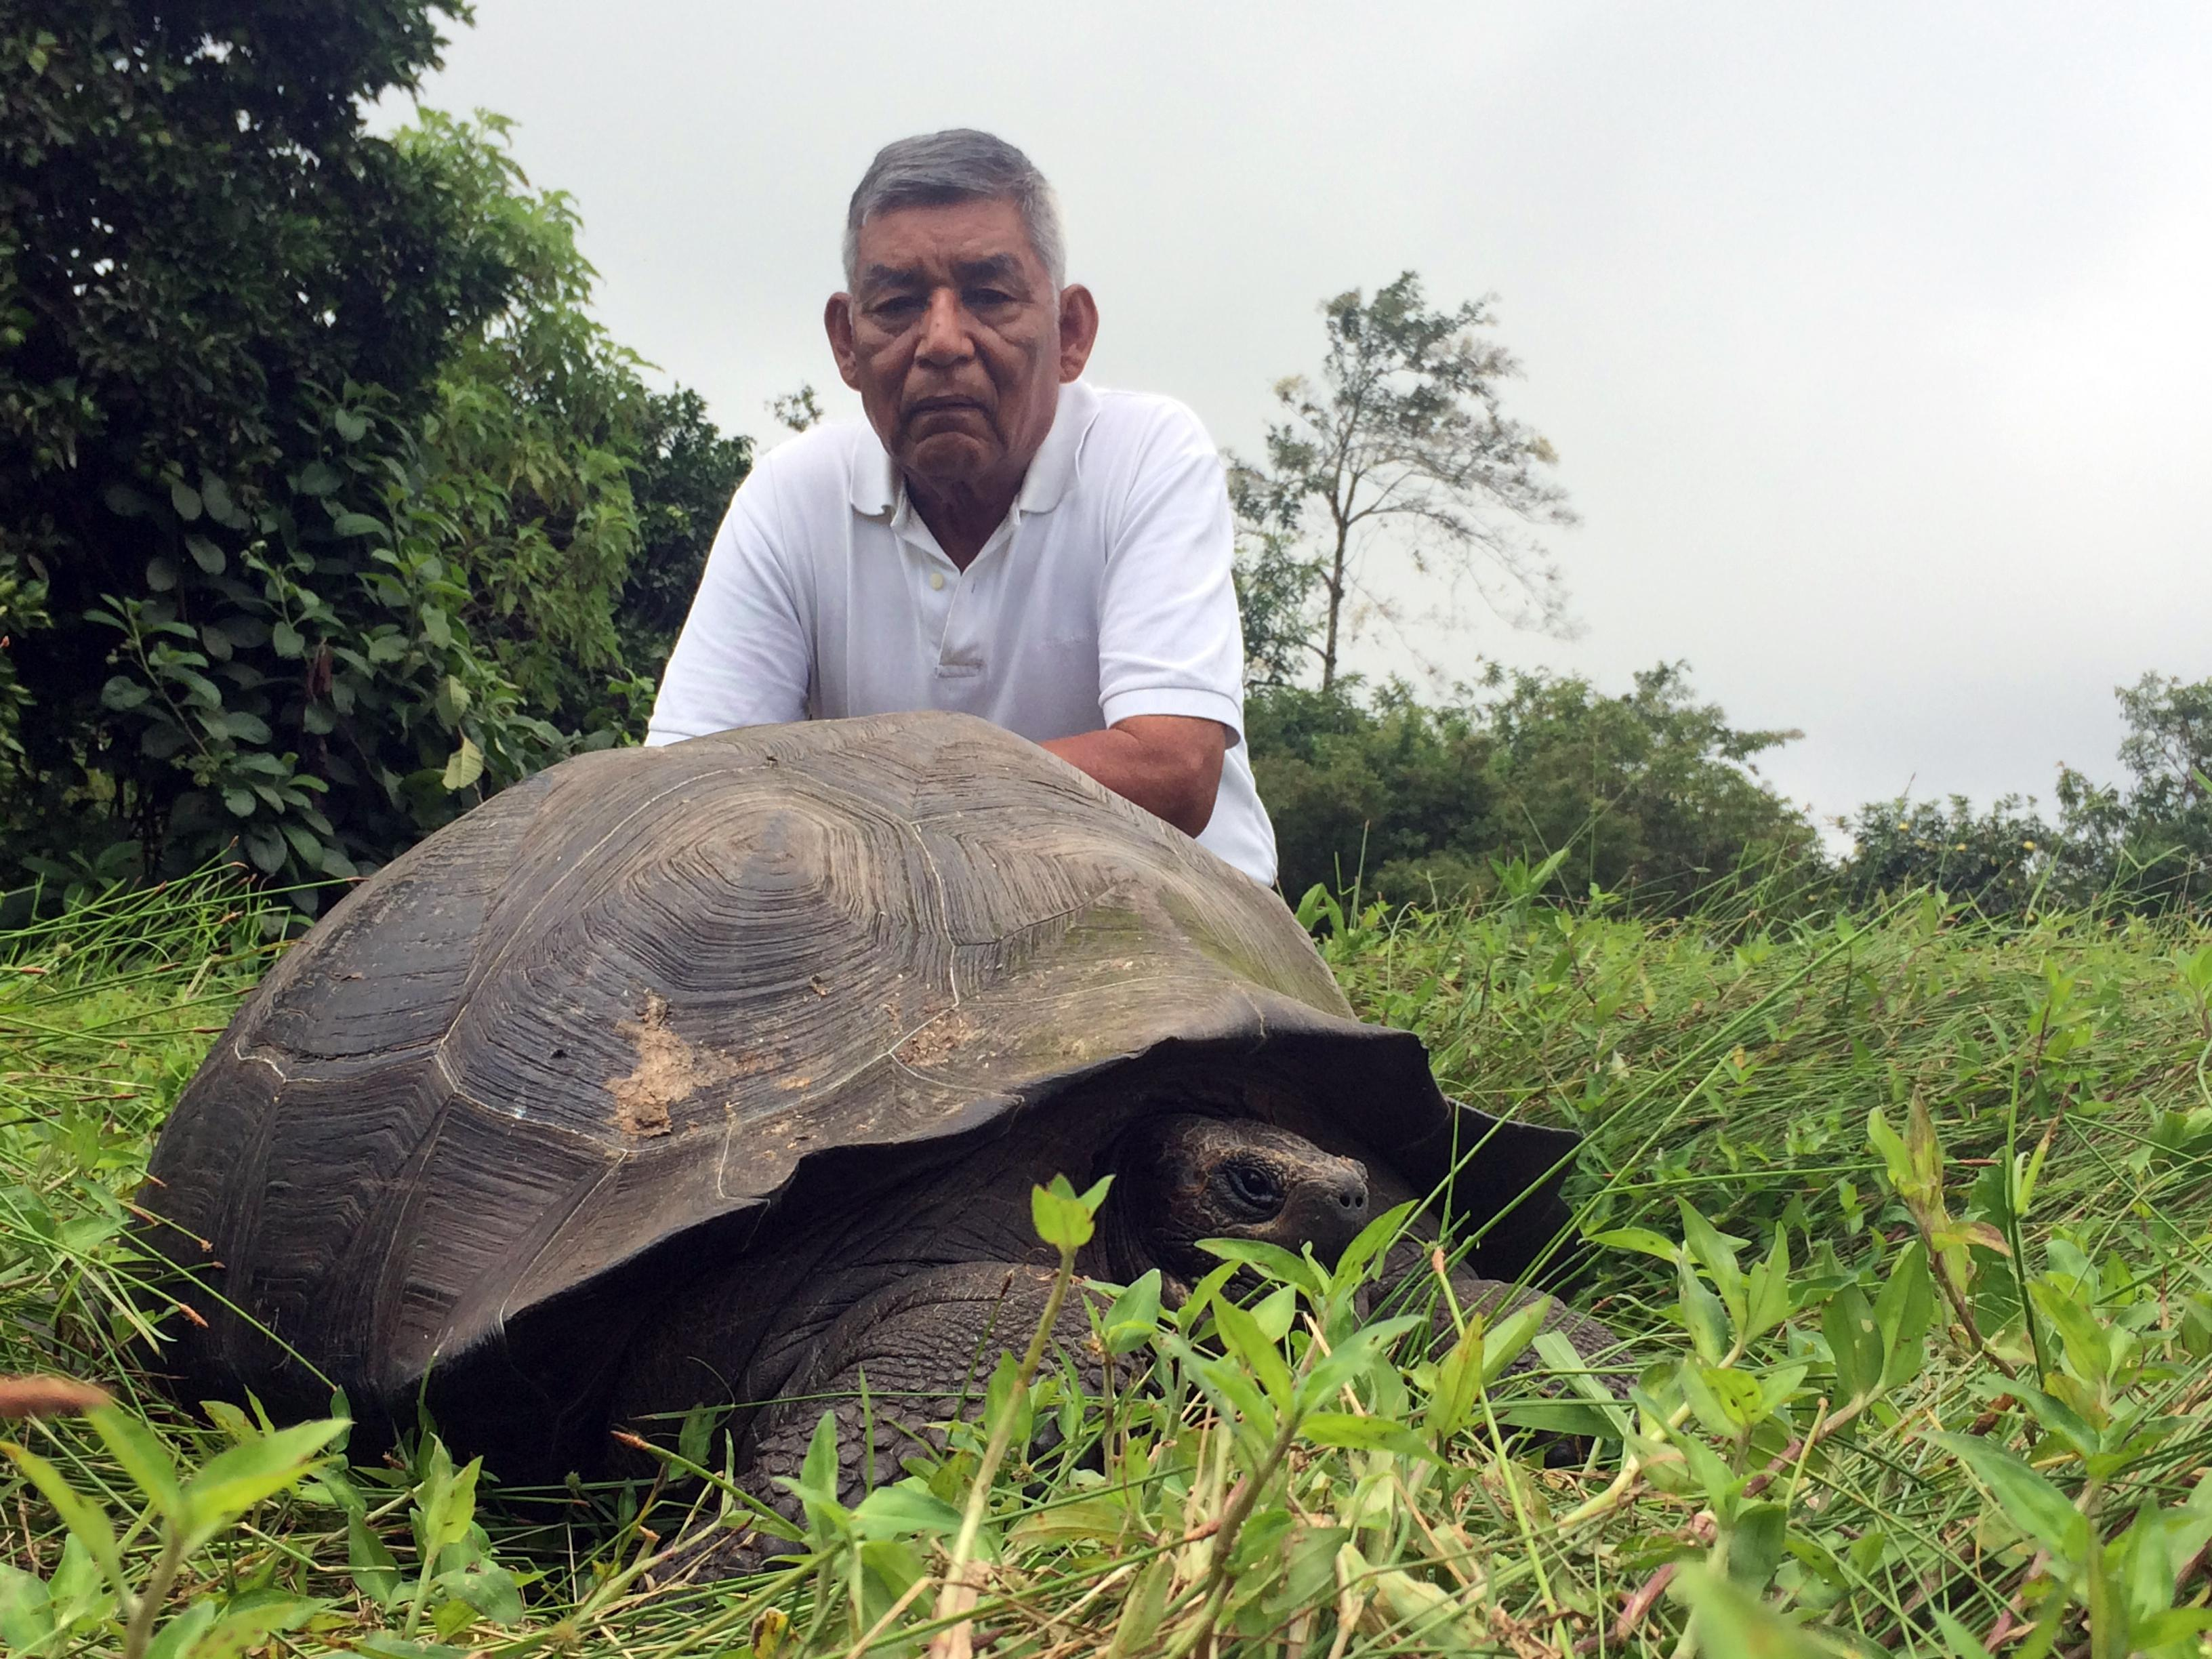 Don_Fausto_w_eastern_santa_cruz_tortoise.jpg